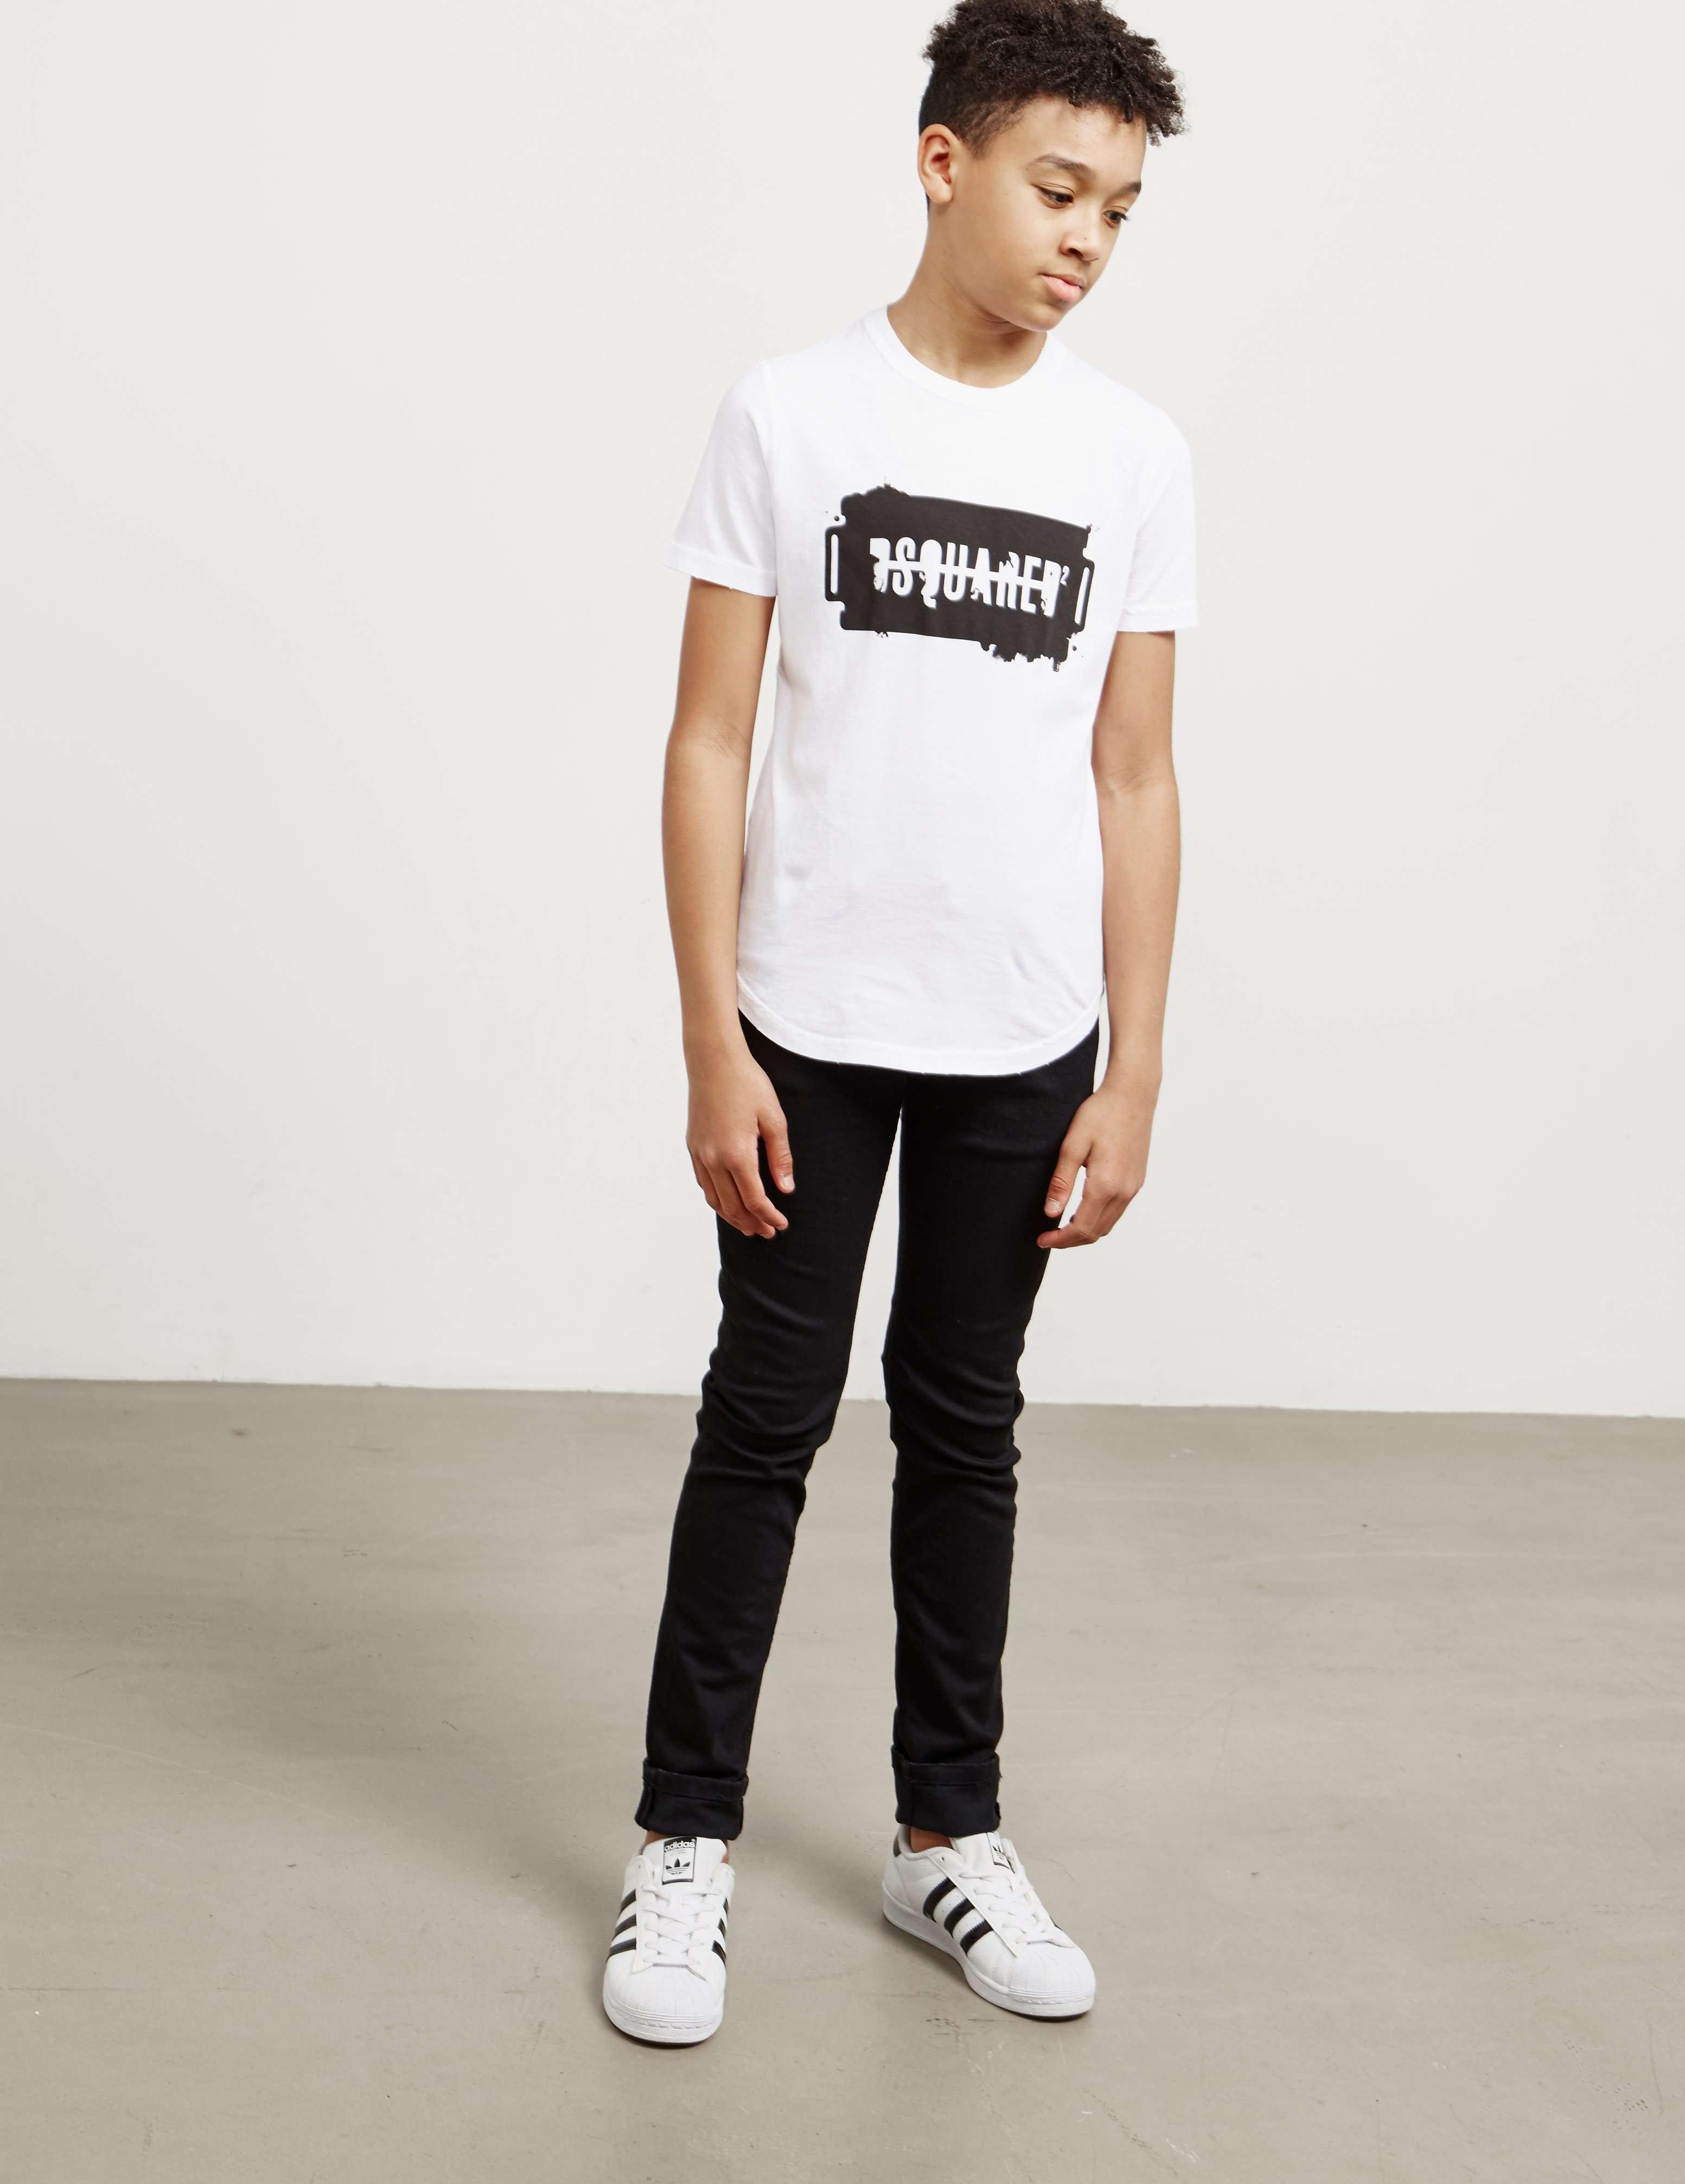 DSQUARED2 Razor Short Sleeve T-Shirt